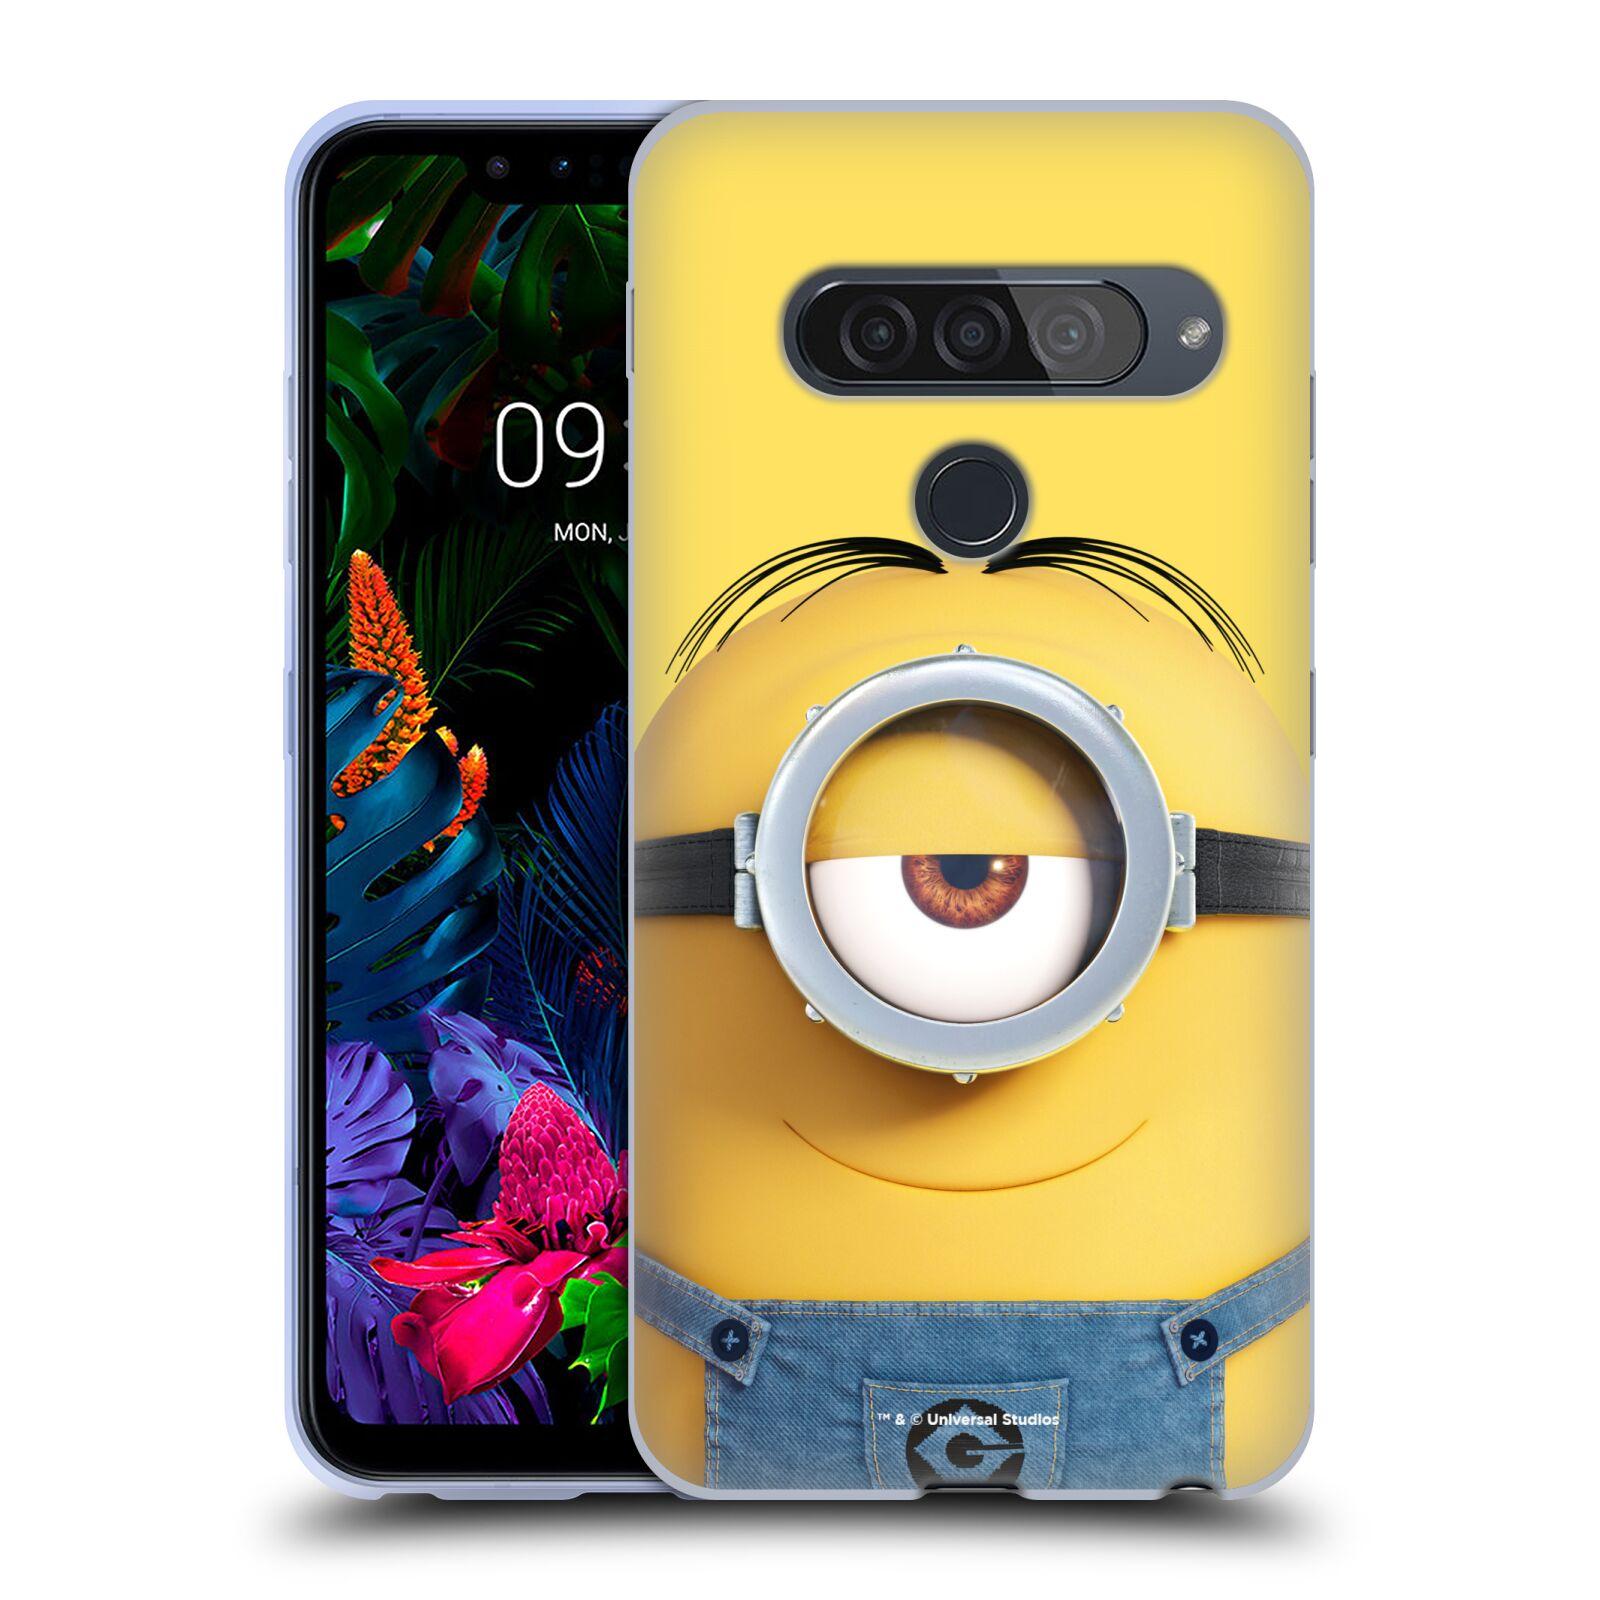 Silikonové pouzdro na mobil LG G8s ThinQ - Head Case - Mimoň Stuart z filmu Já, padouch - Despicable Me